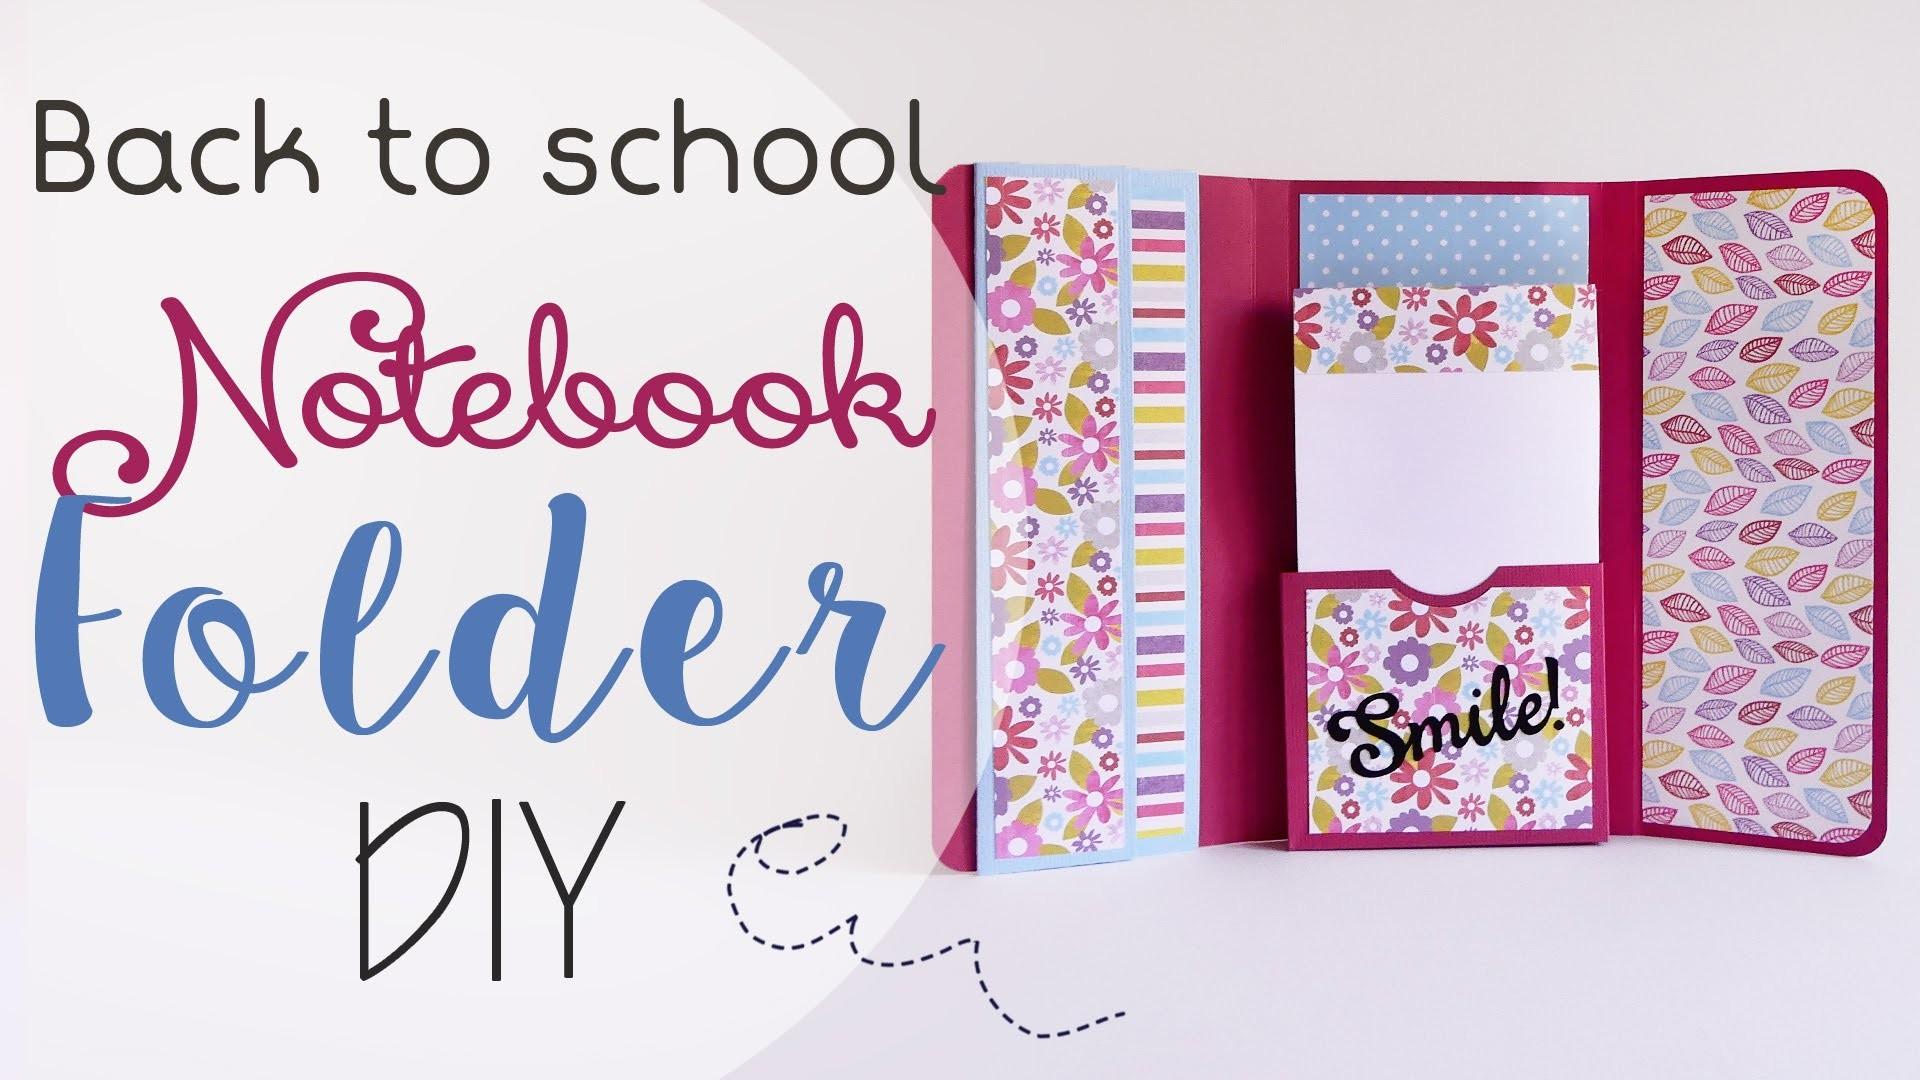 Scuola: Cartella porta Appunti - ENG SUBS School: Notebook Folder DIY